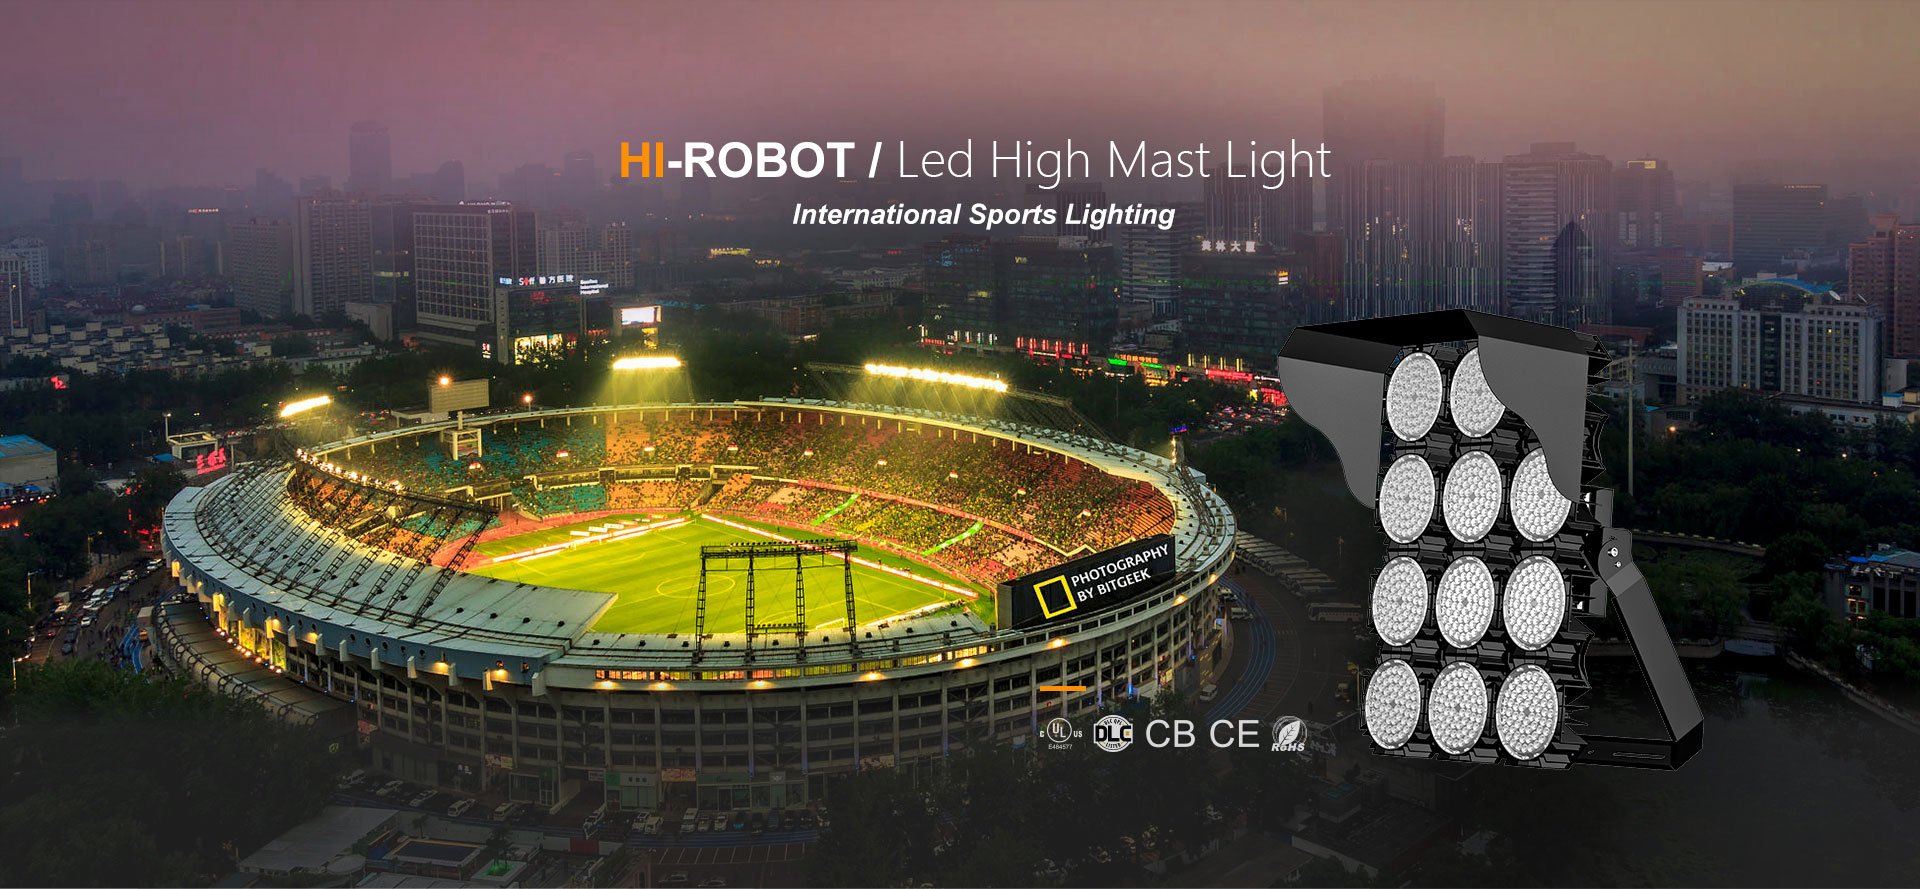 Hi-Robot LED High Mast Light 1300W